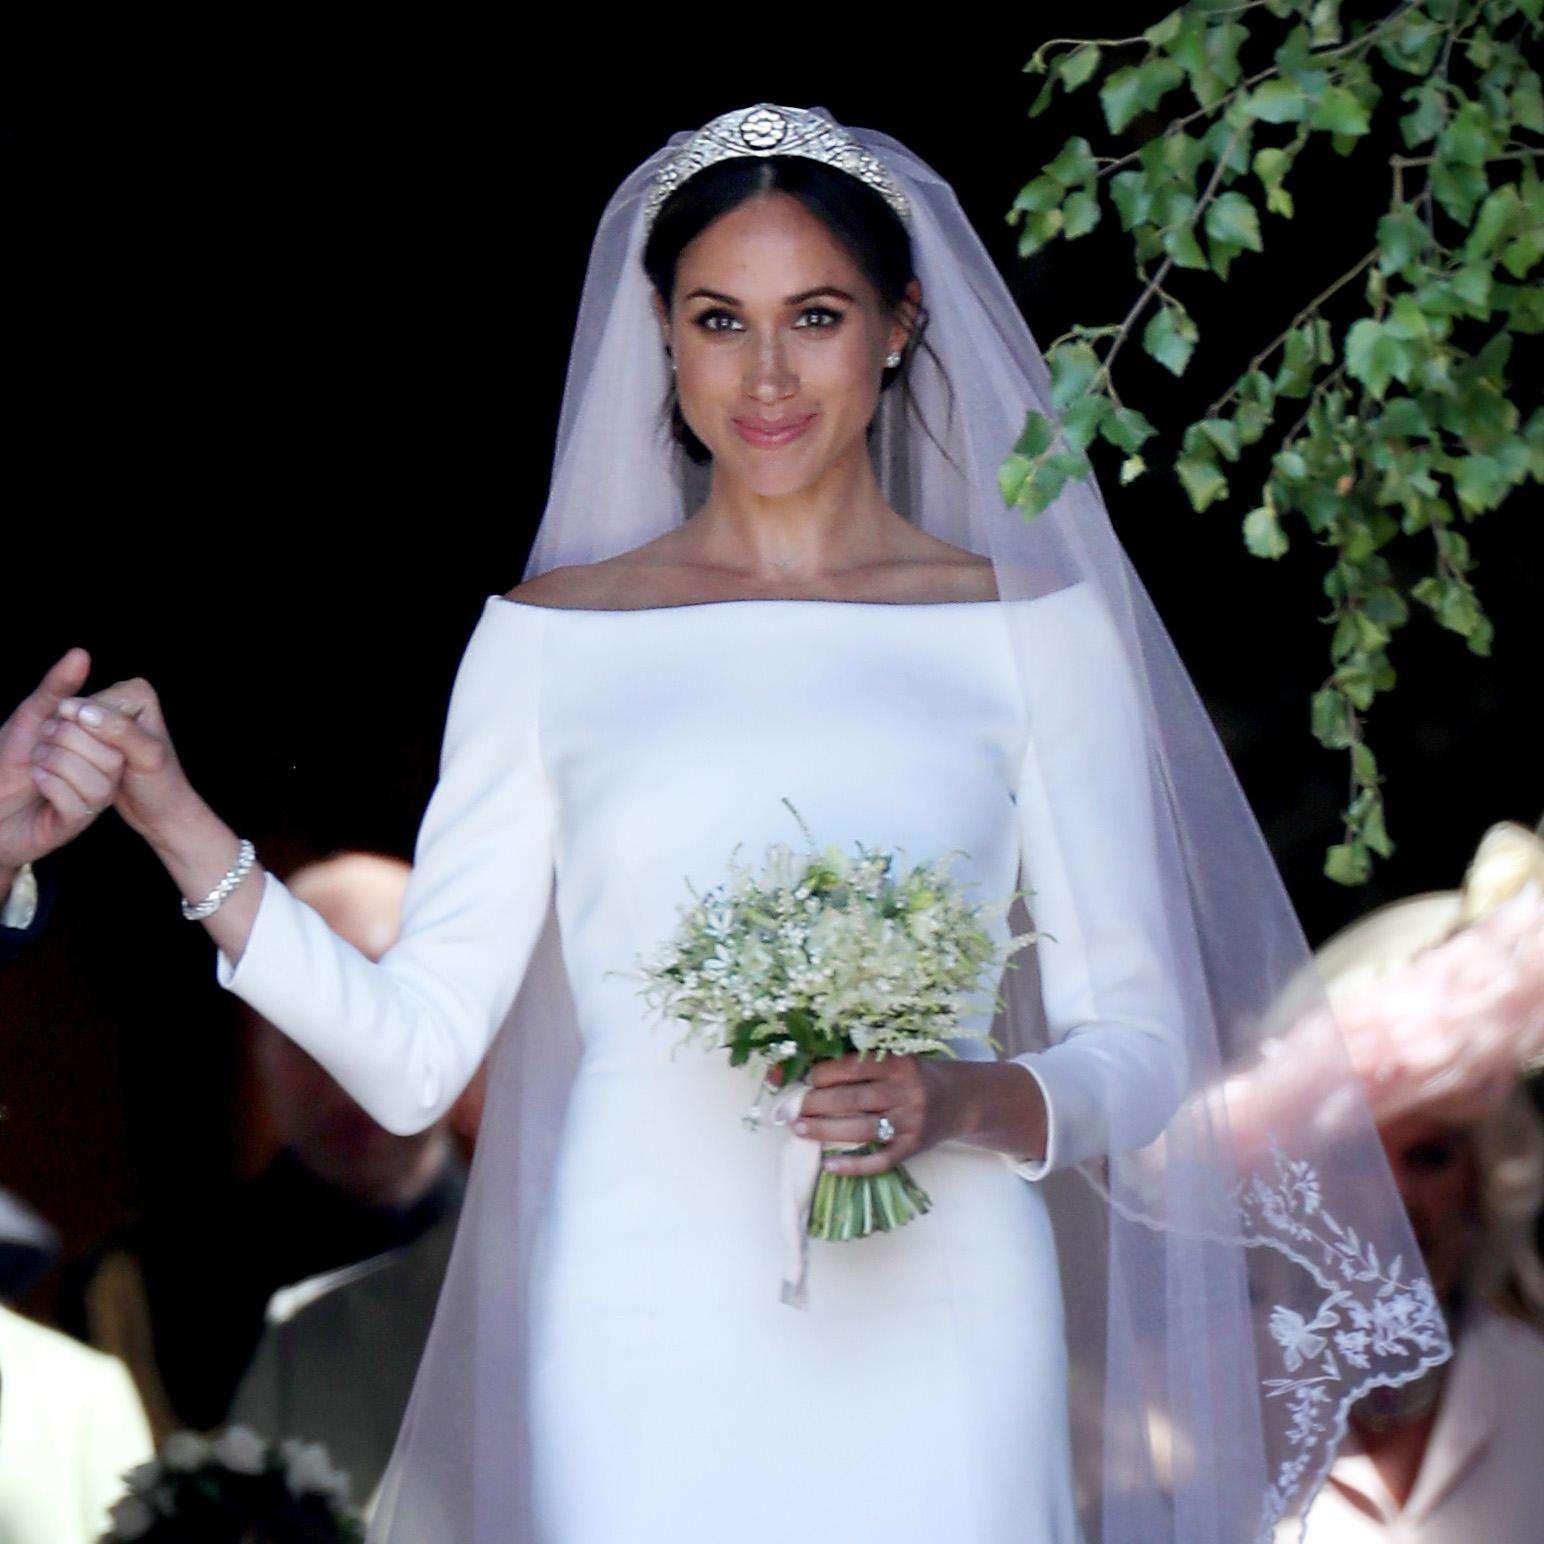 Royal Wedding Dress Meghan Markle.Watch Meghan Markle See Her Givenchy Wedding Dress The Day Before